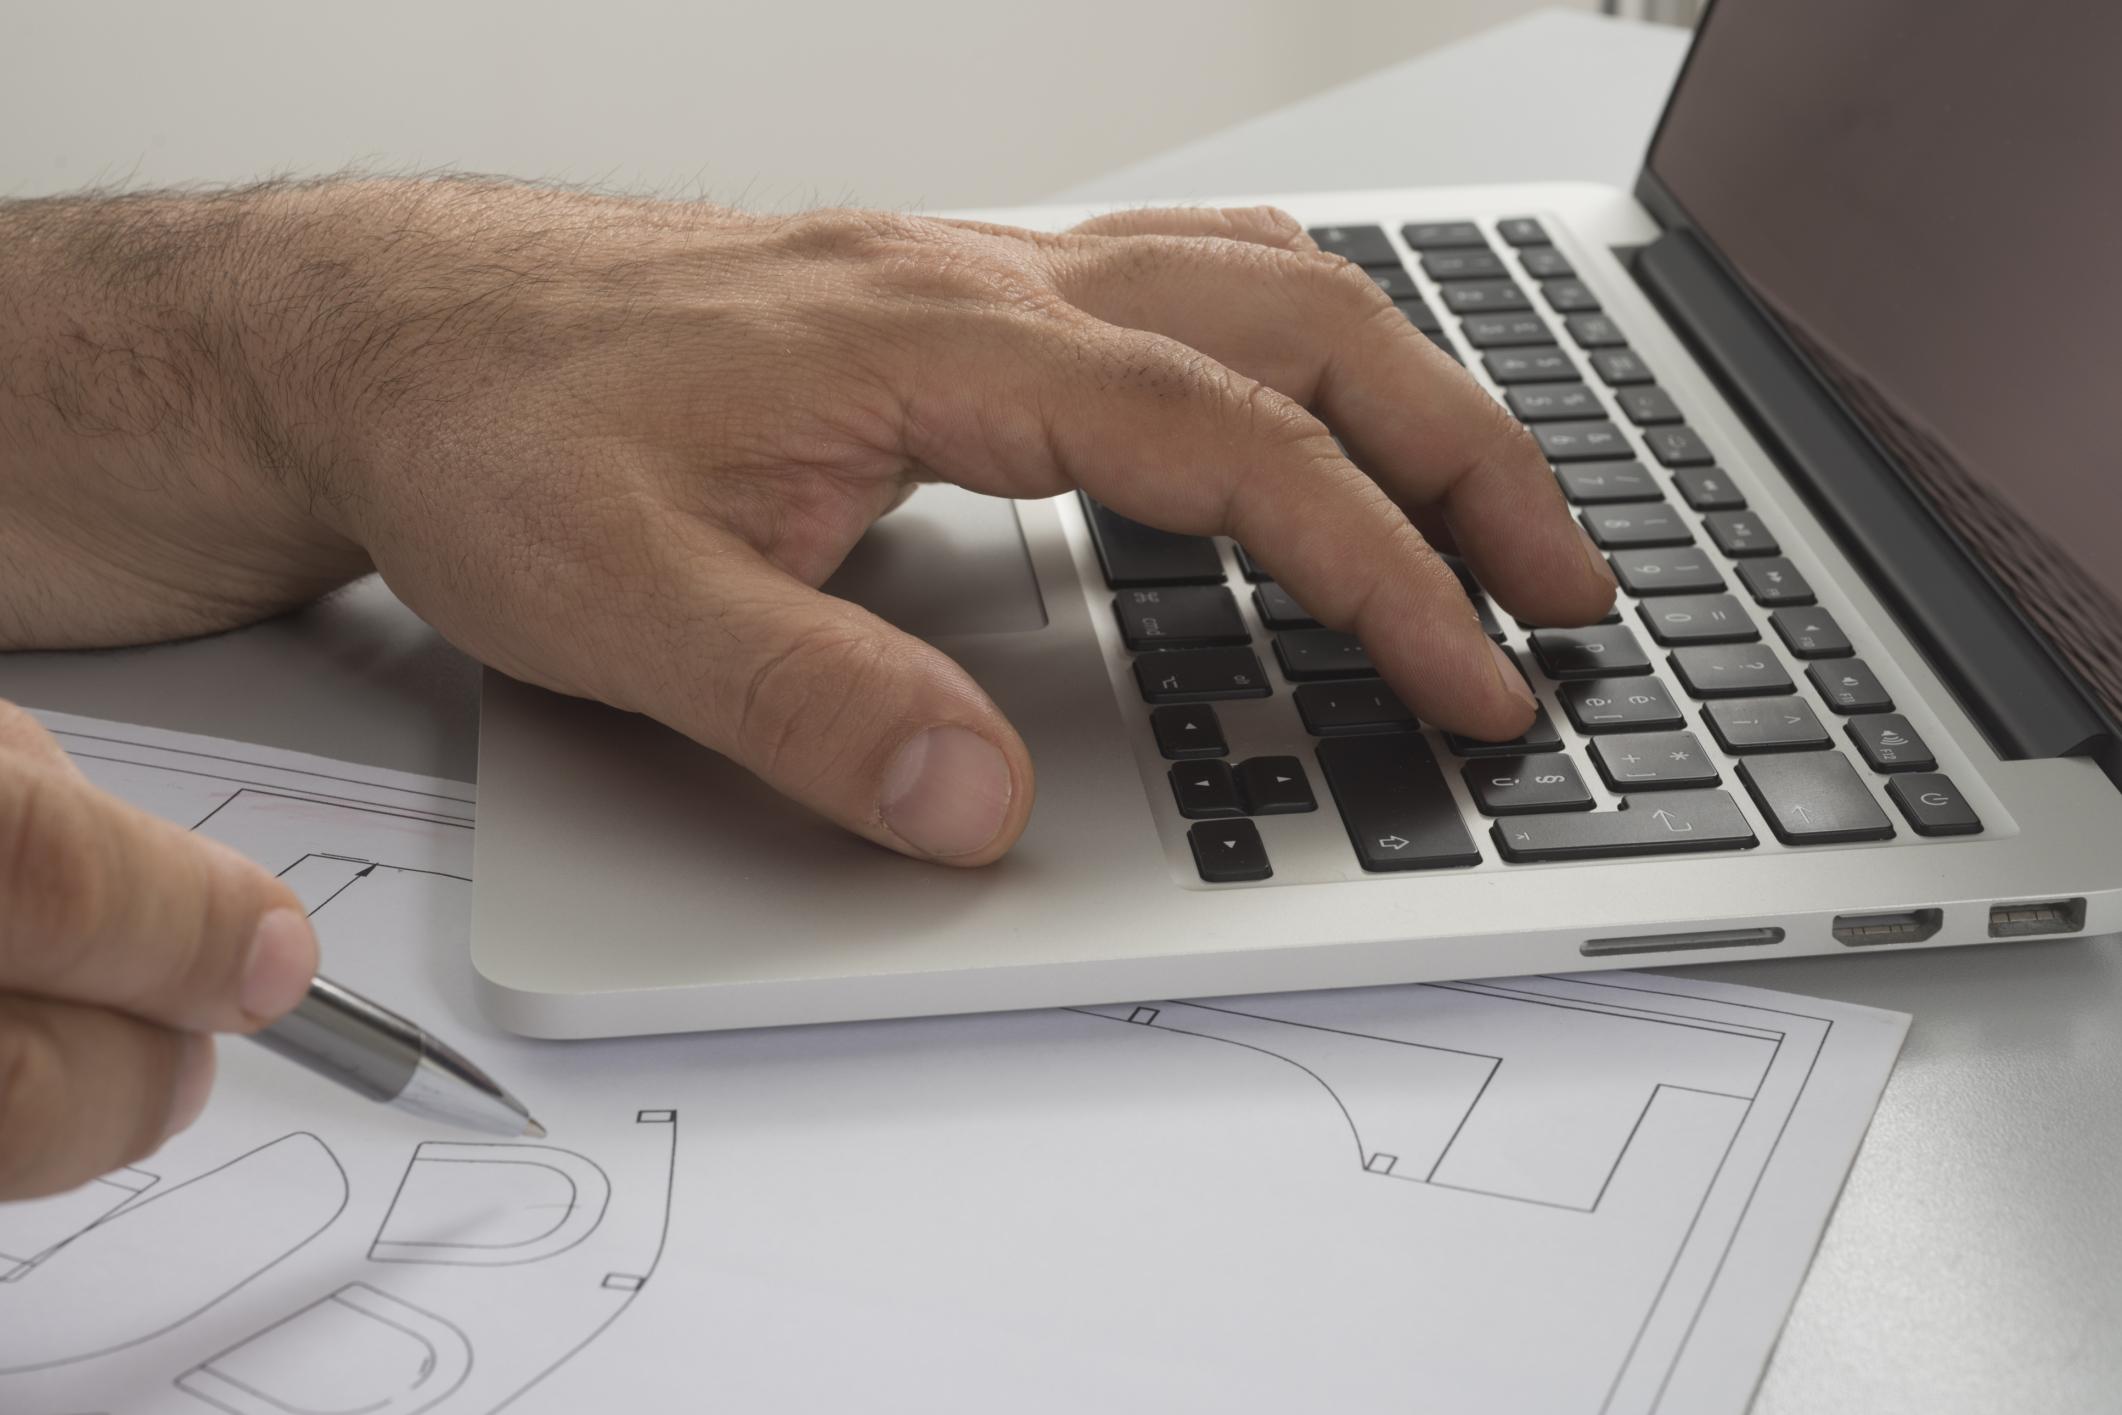 How to Start a Small Copier Business | Bizfluent